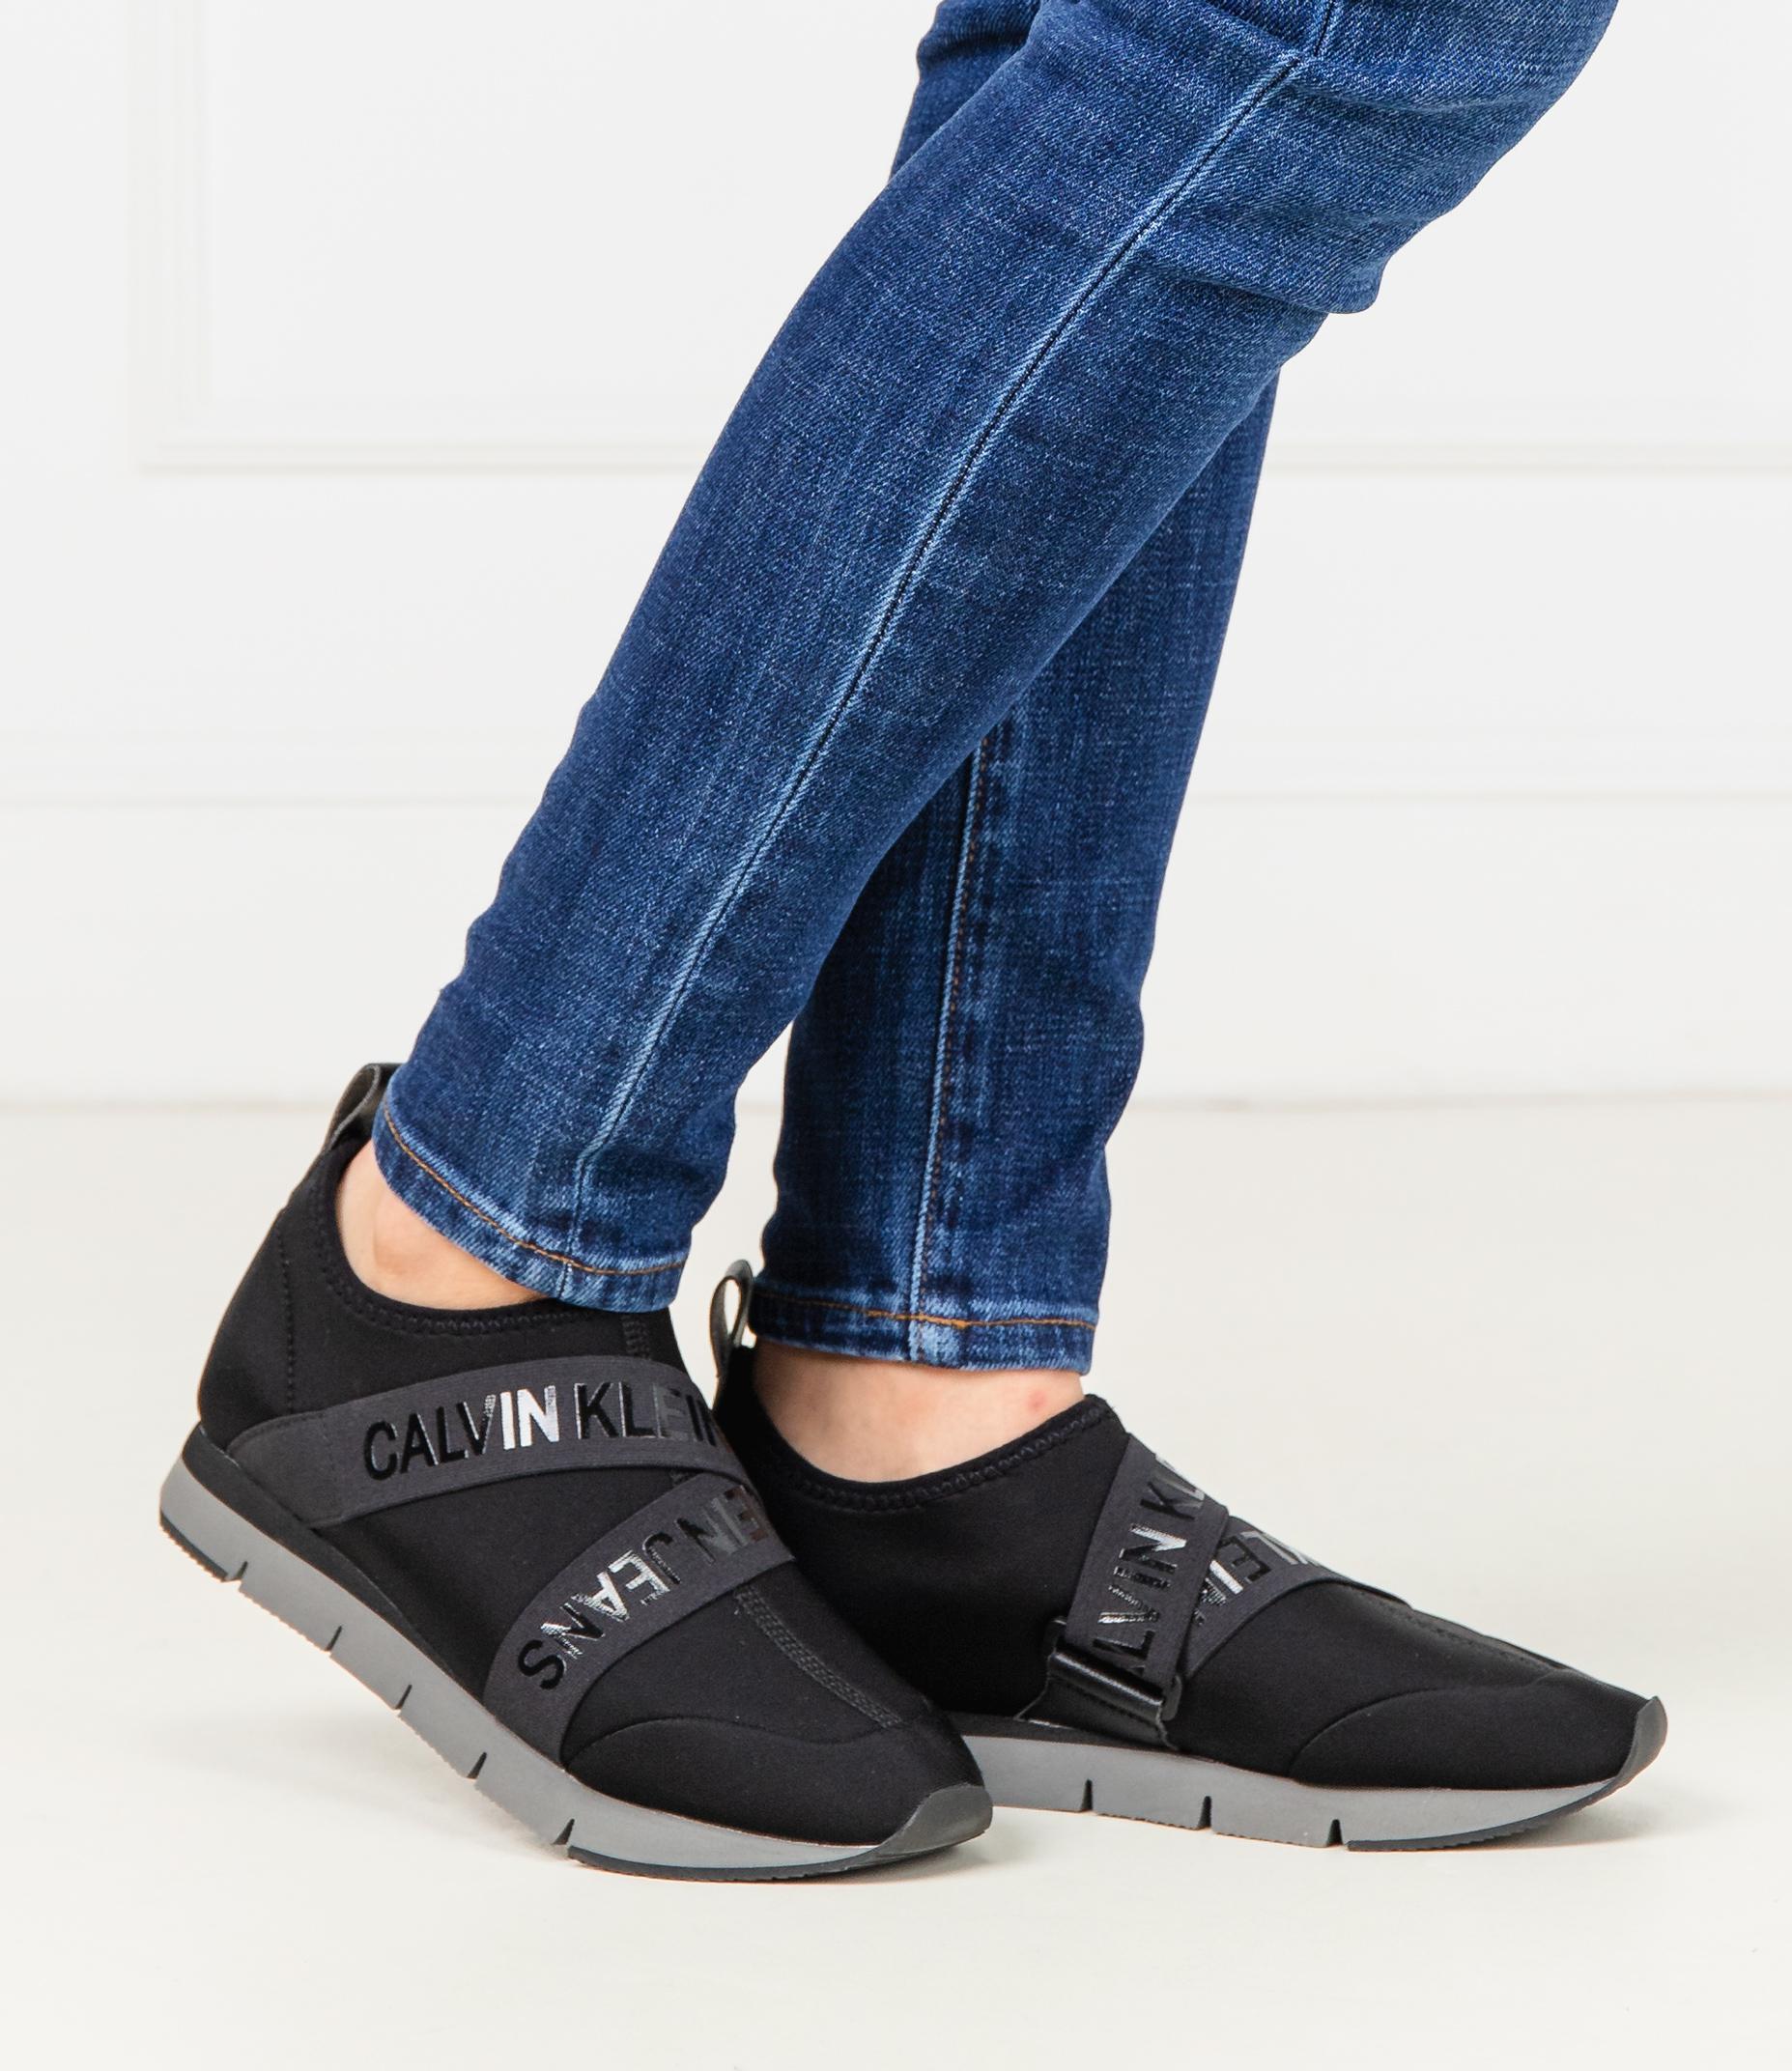 calvin klein black jeans tonia trainers